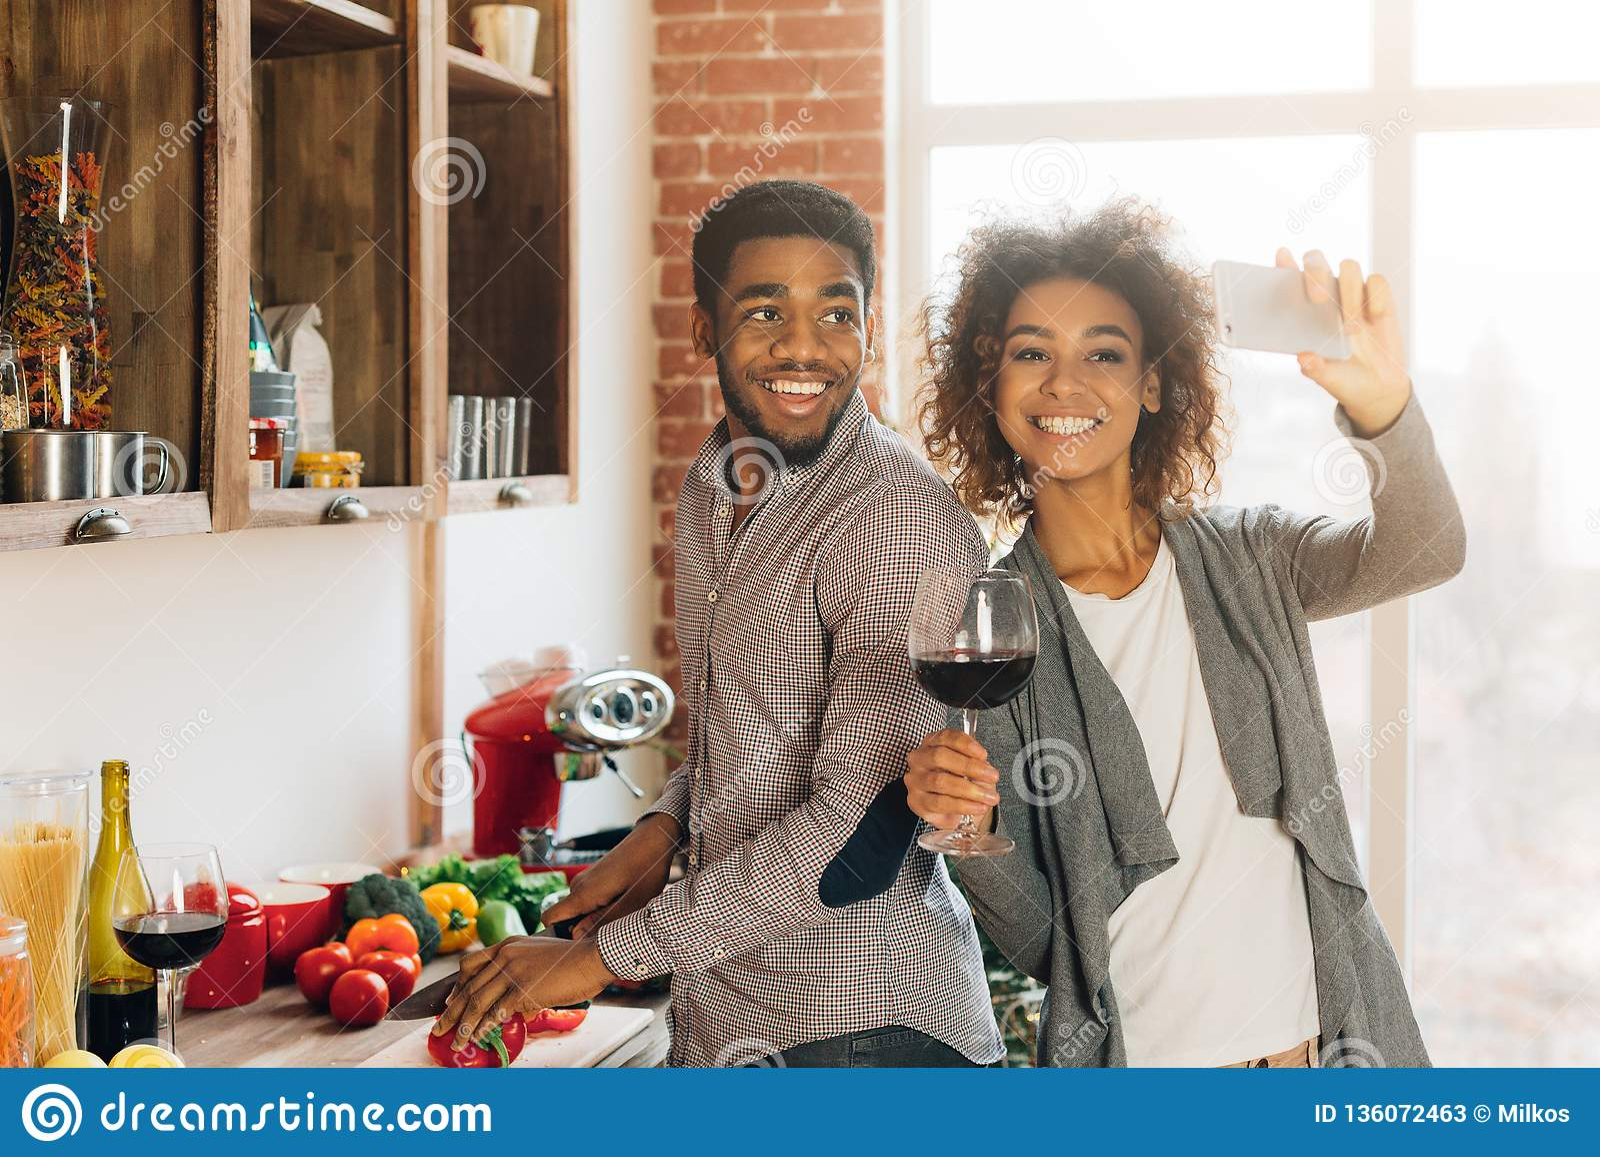 Diamond recommend best of black girls kitchen